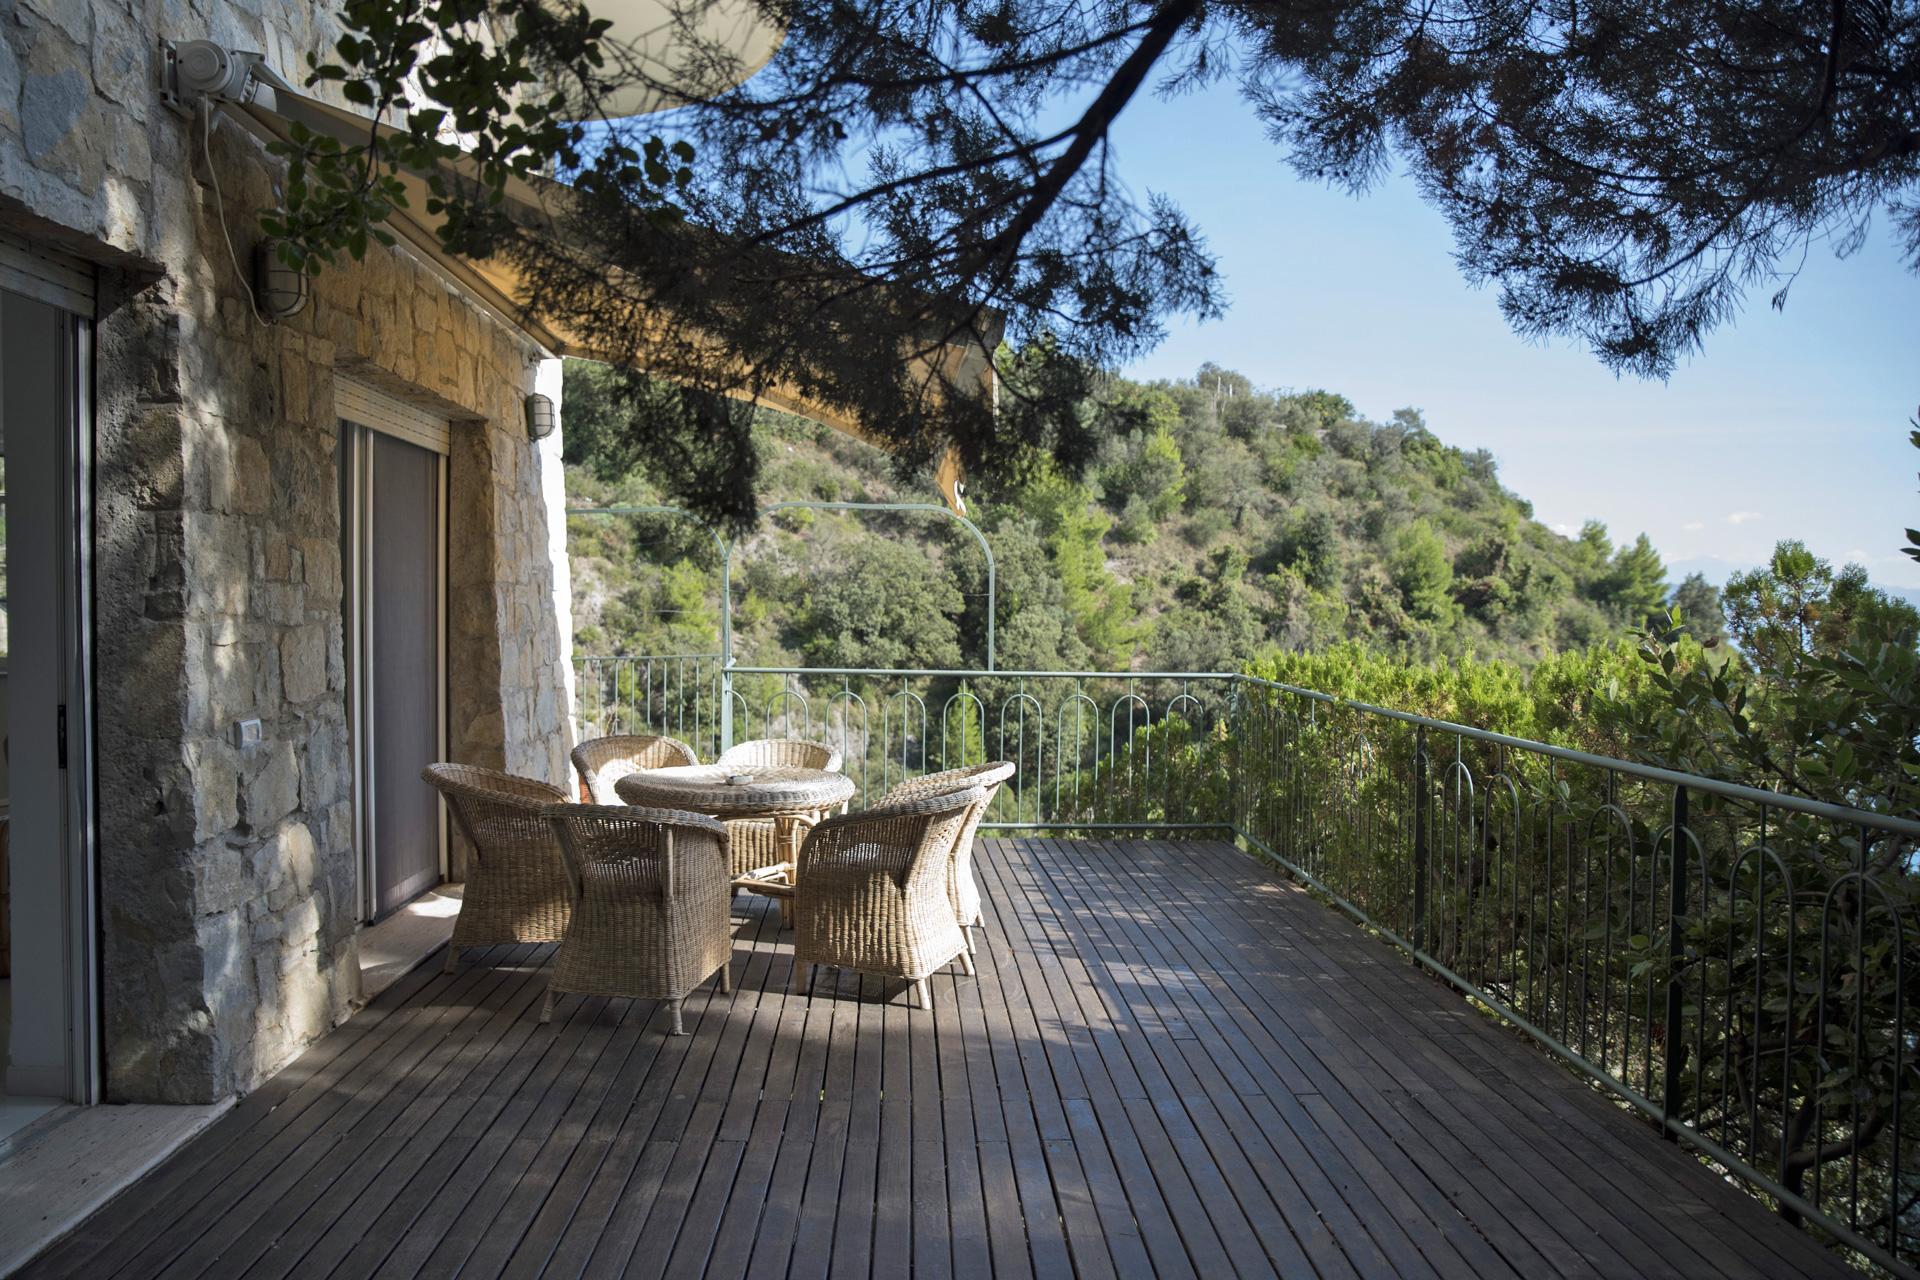 Villa lemon beach erchie costiera amalfitana discesa for Piani di casa di 1300 piedi quadrati 2 piani